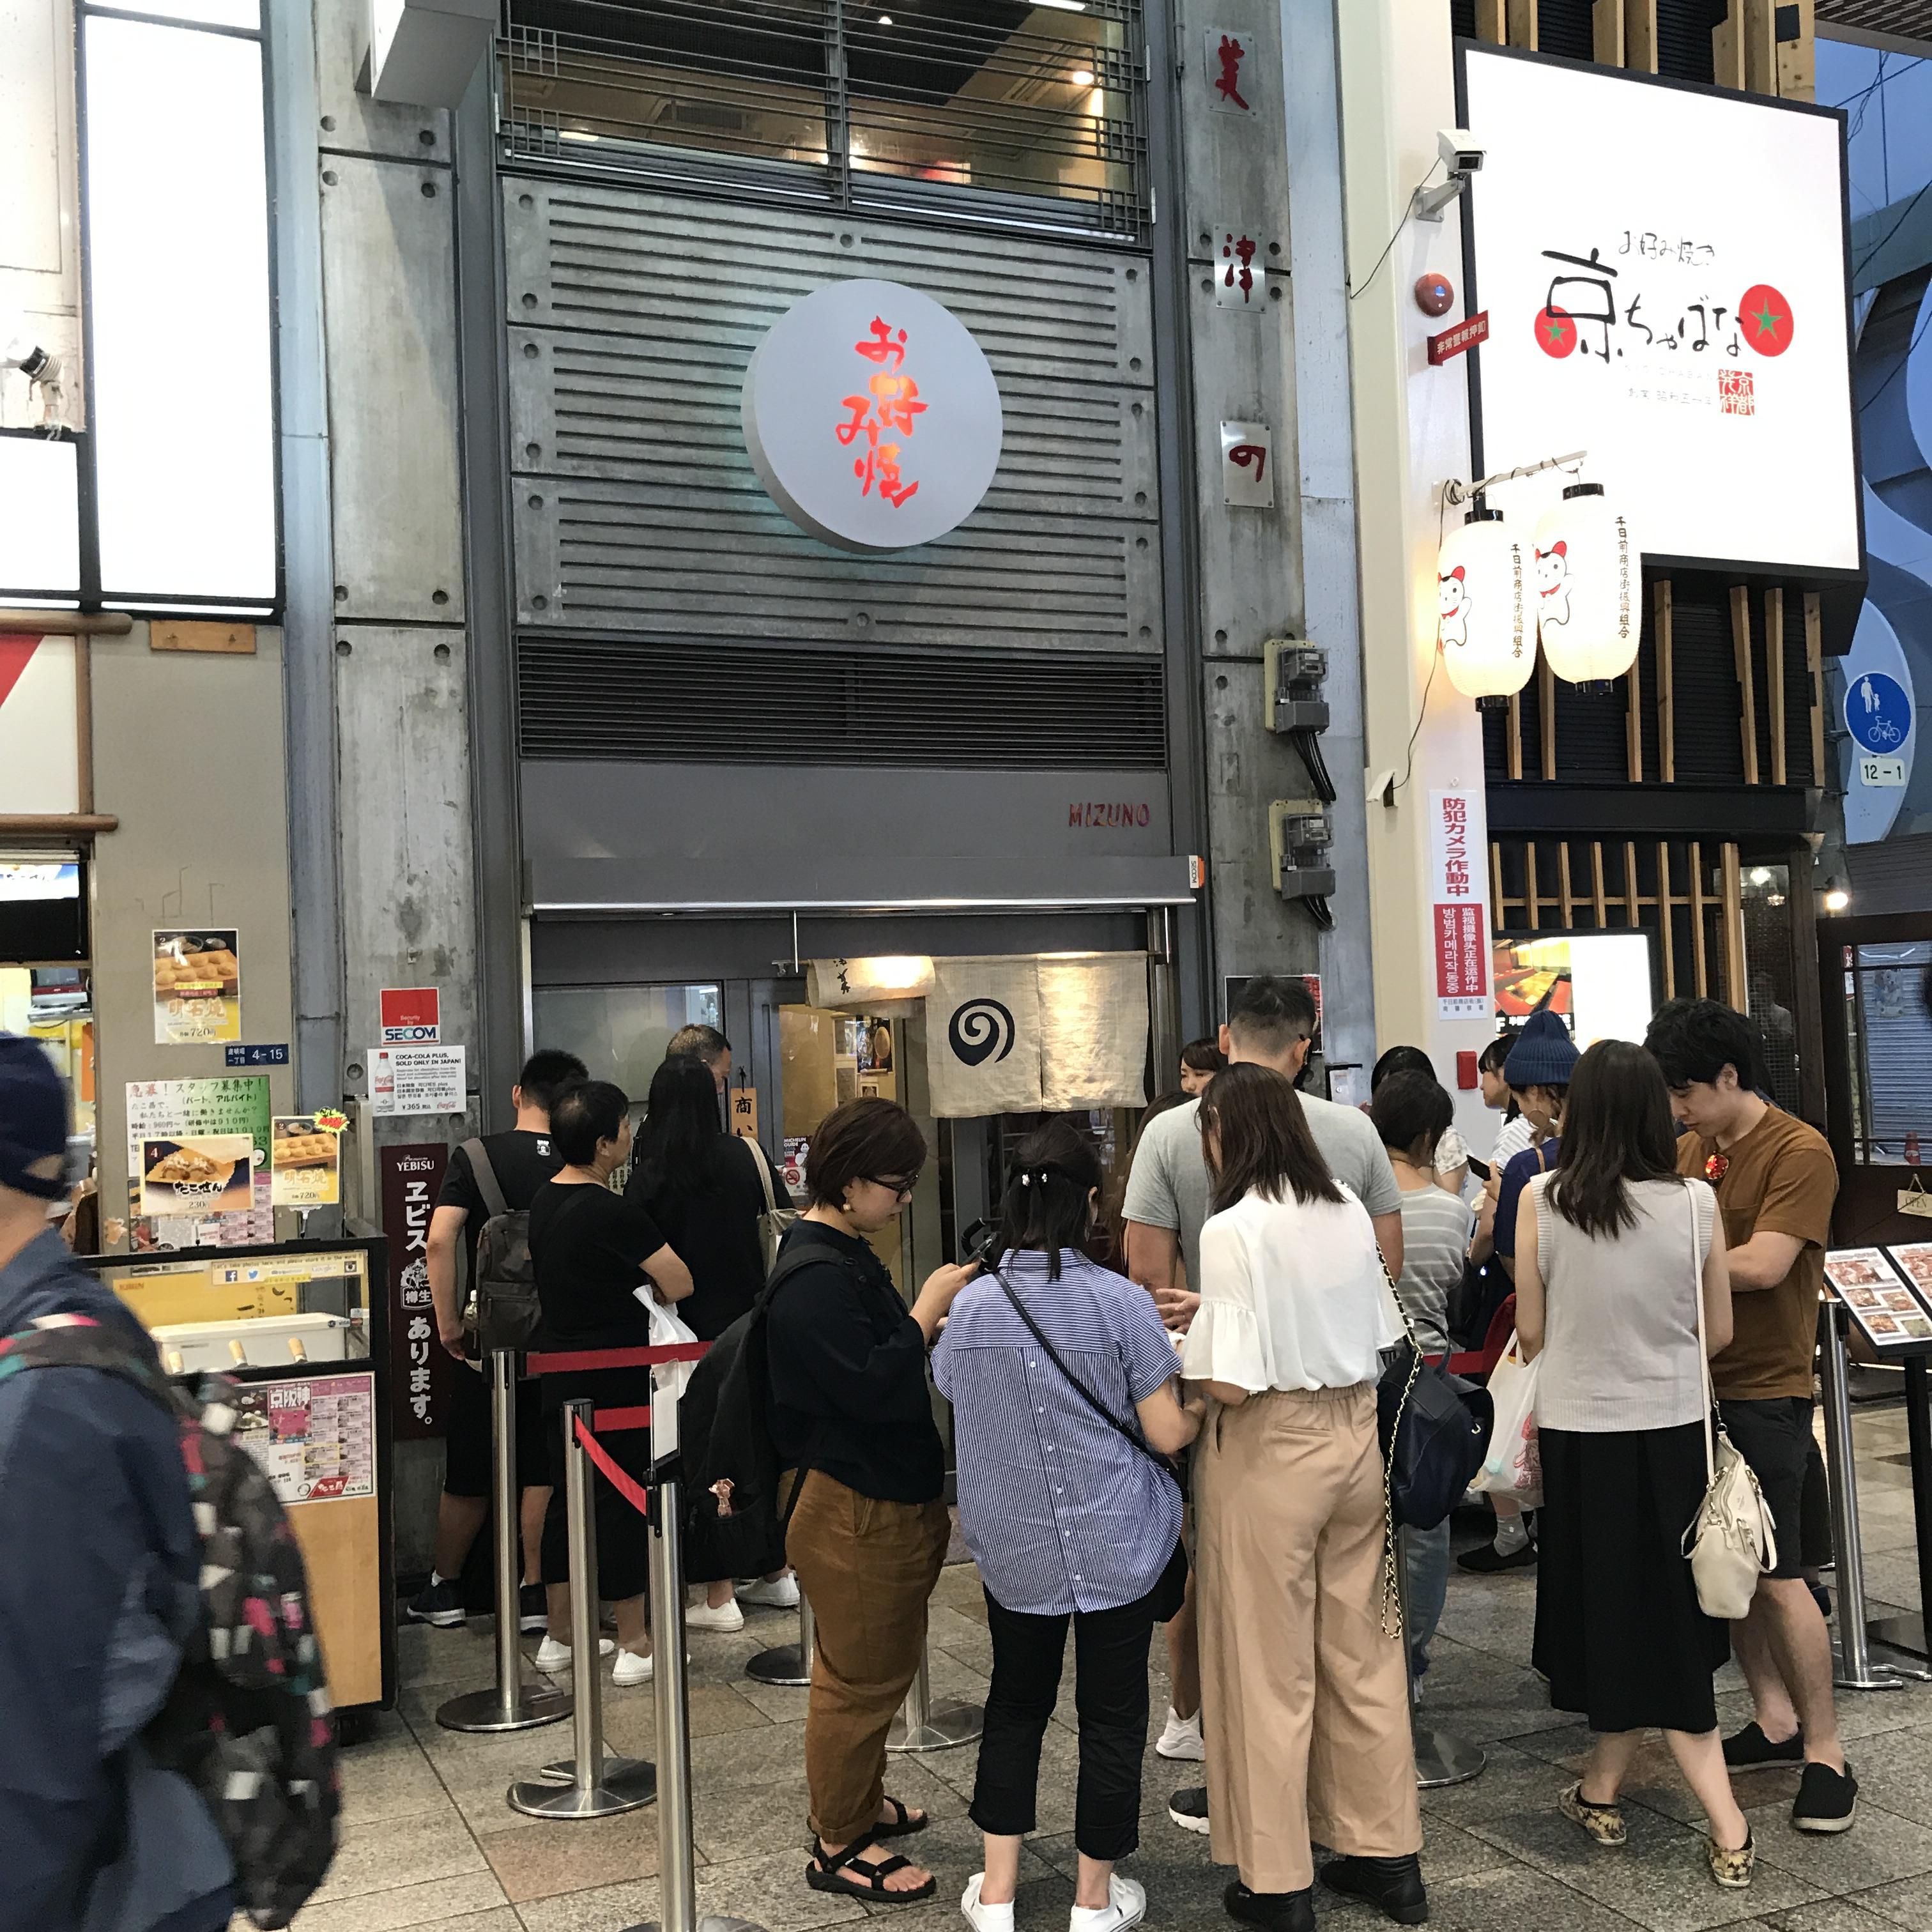 uniek ontwerp 100% echt mode stijlen お好み焼「美津の」Mizuno Okonomiyaki @Osaka, Japan | Eat.Eat ...